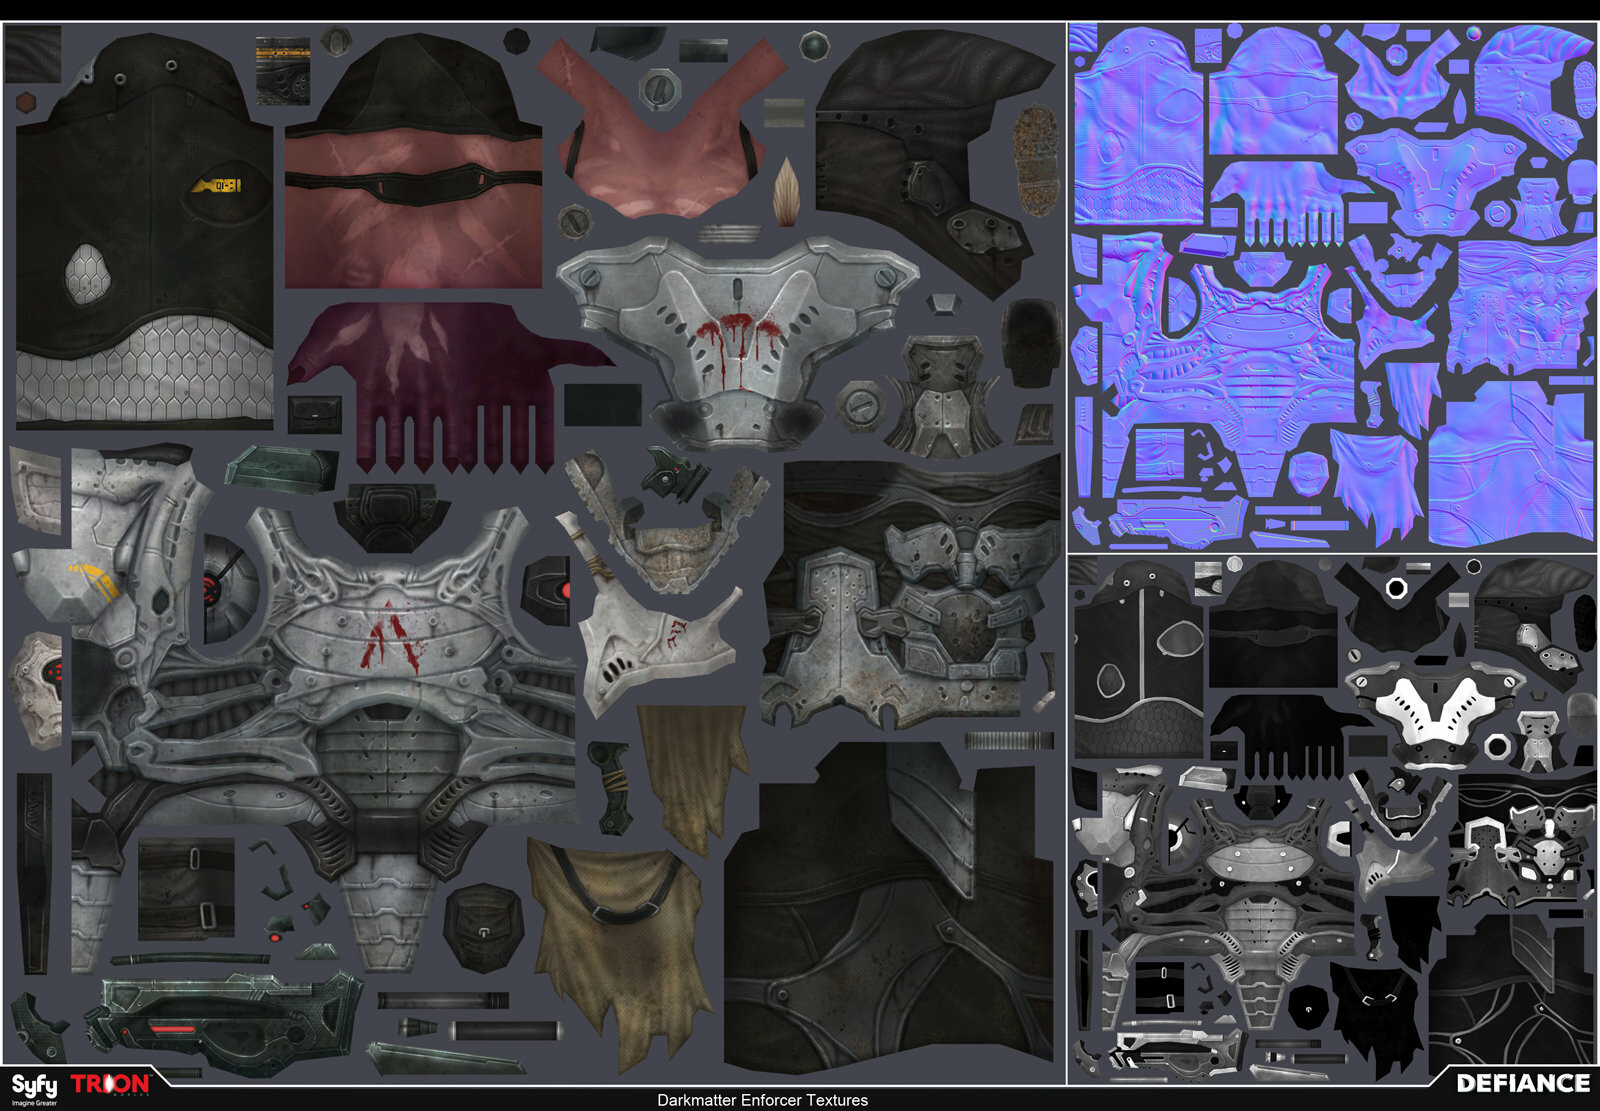 Satoshi arakawa npc darkmatter enforcer textures